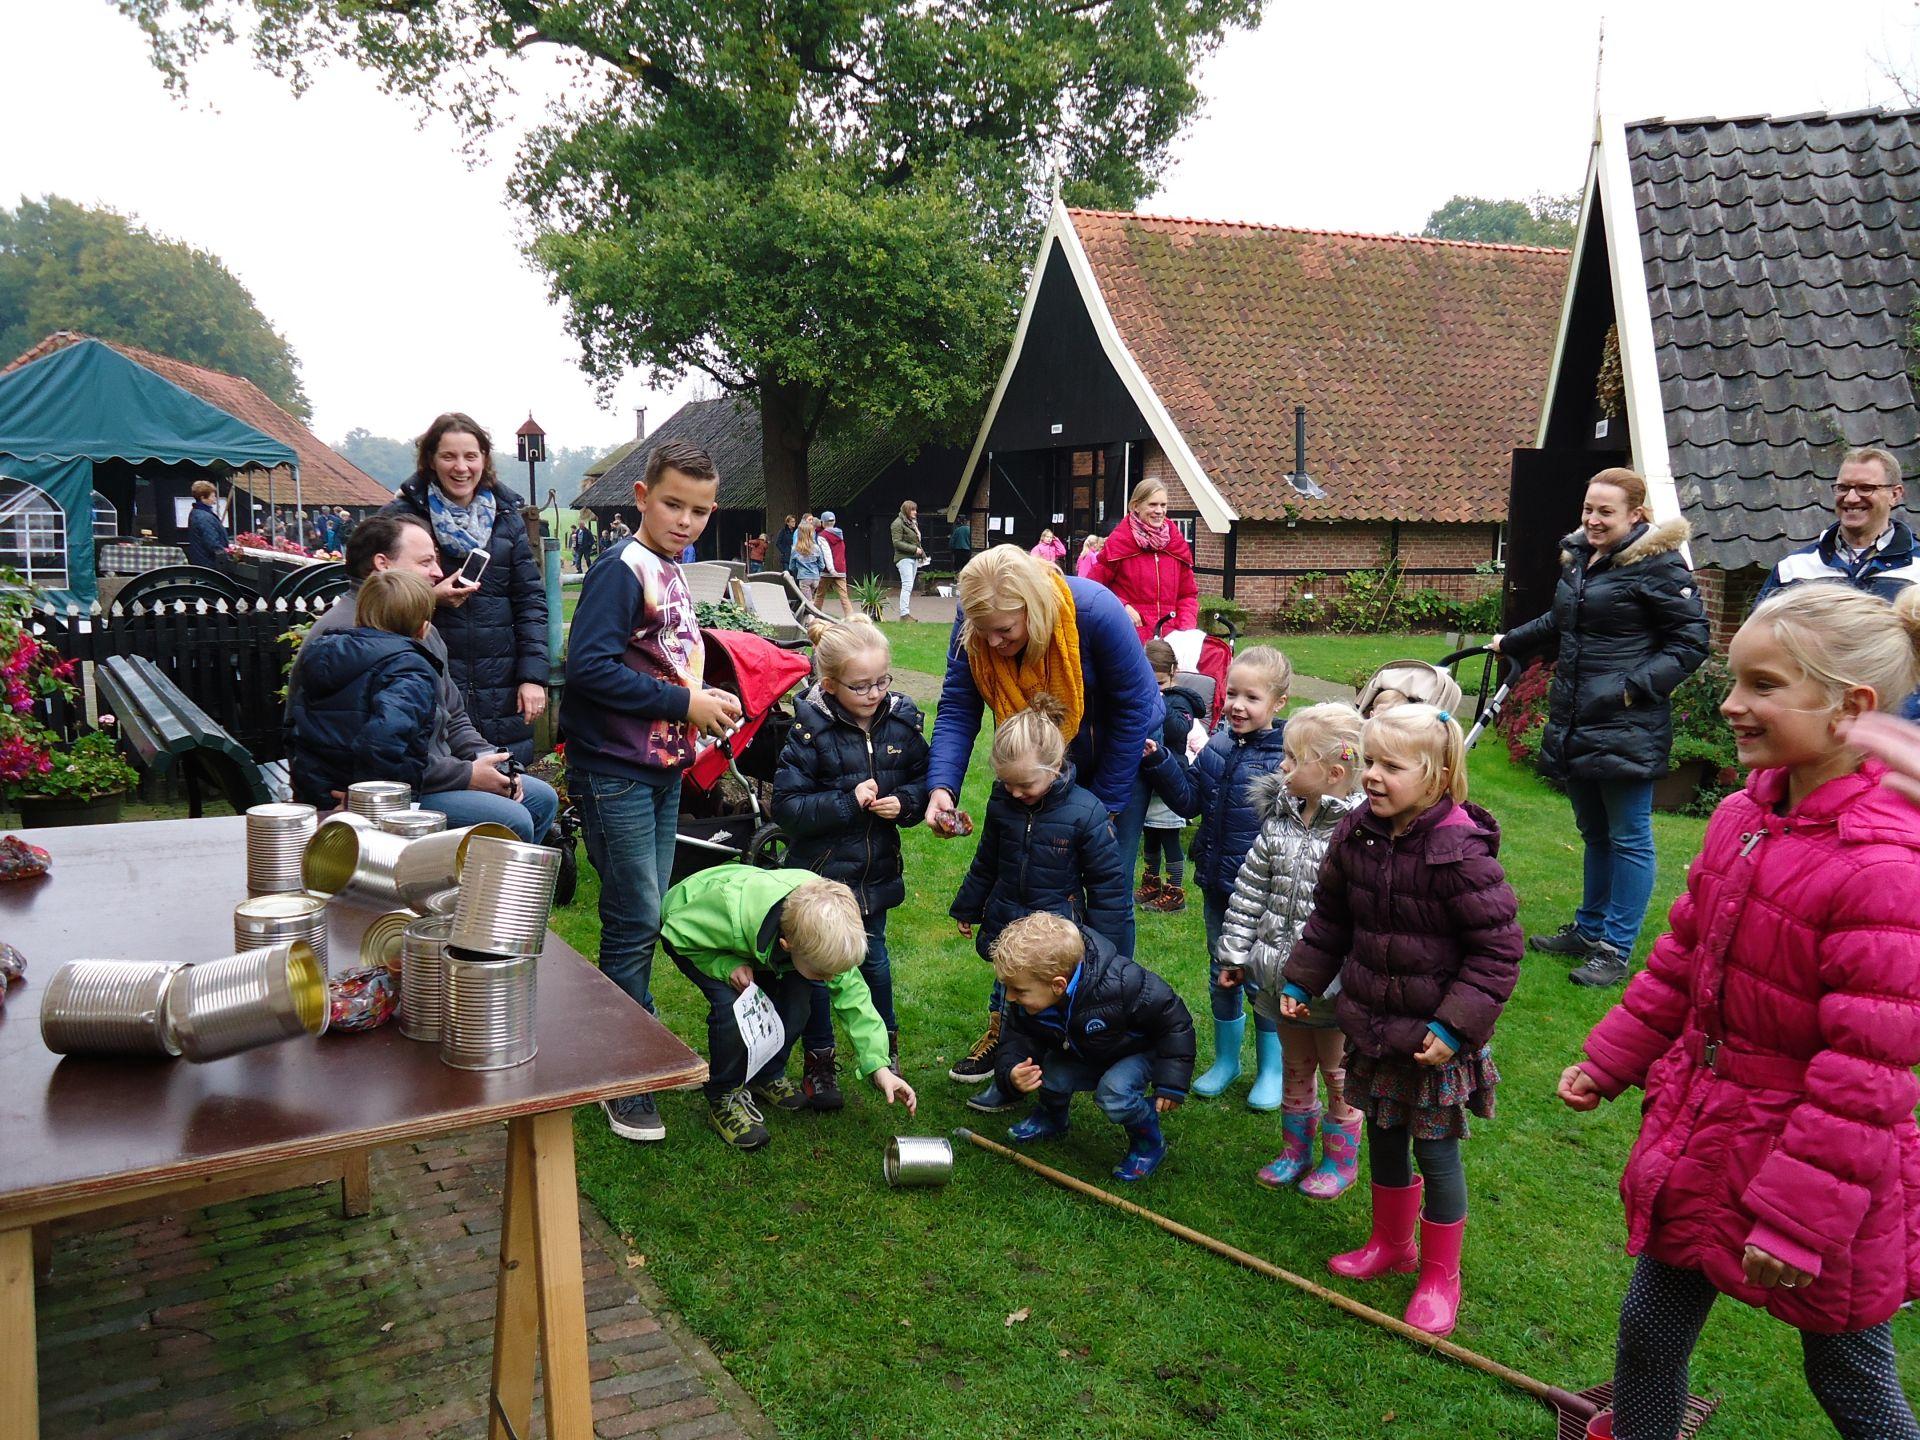 Museumboerderij Wendezoele op 2 mei weer geopend voor publiek